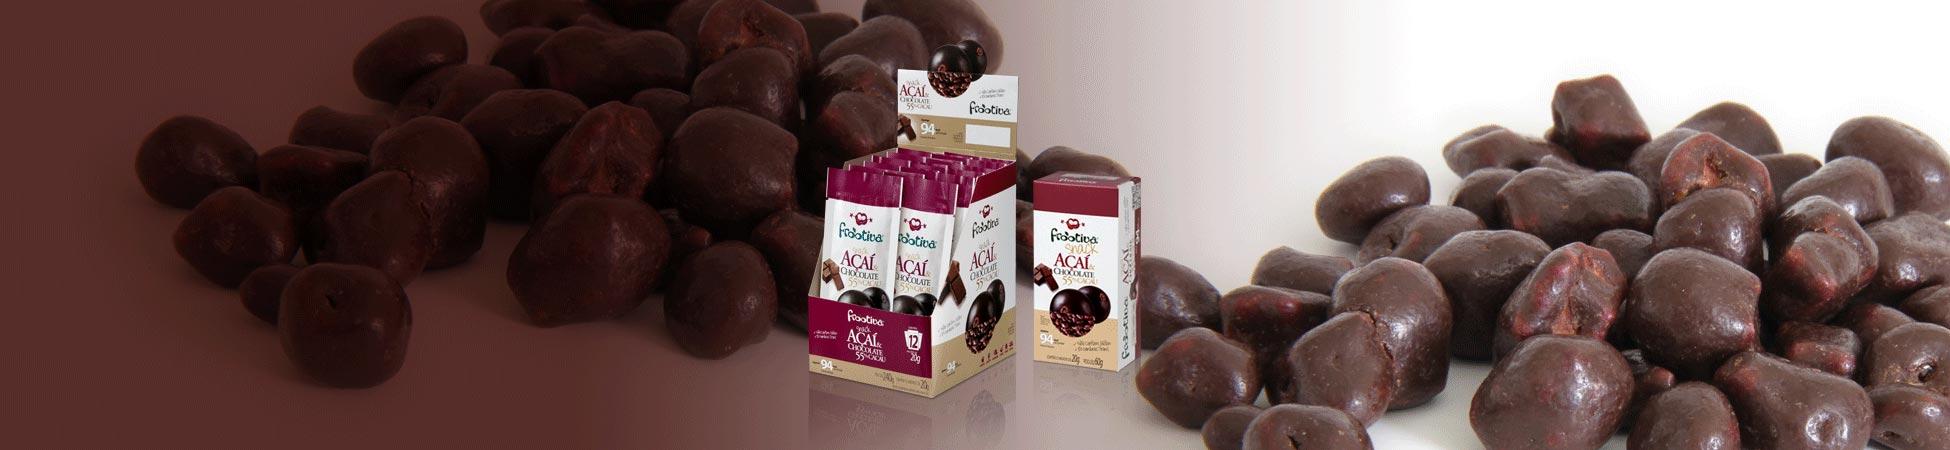 tripaHm-chocolate